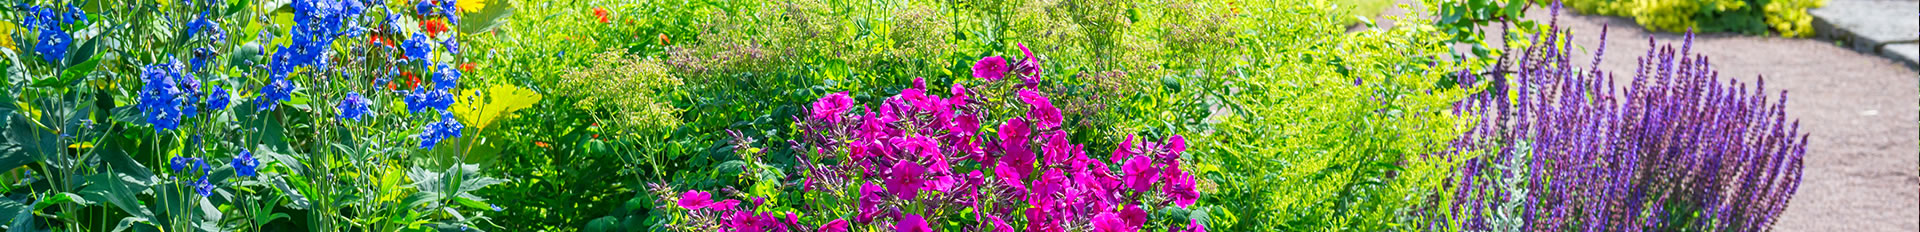 Resources | Baumgartner Funeral Home & Greenlawn Memorial Park